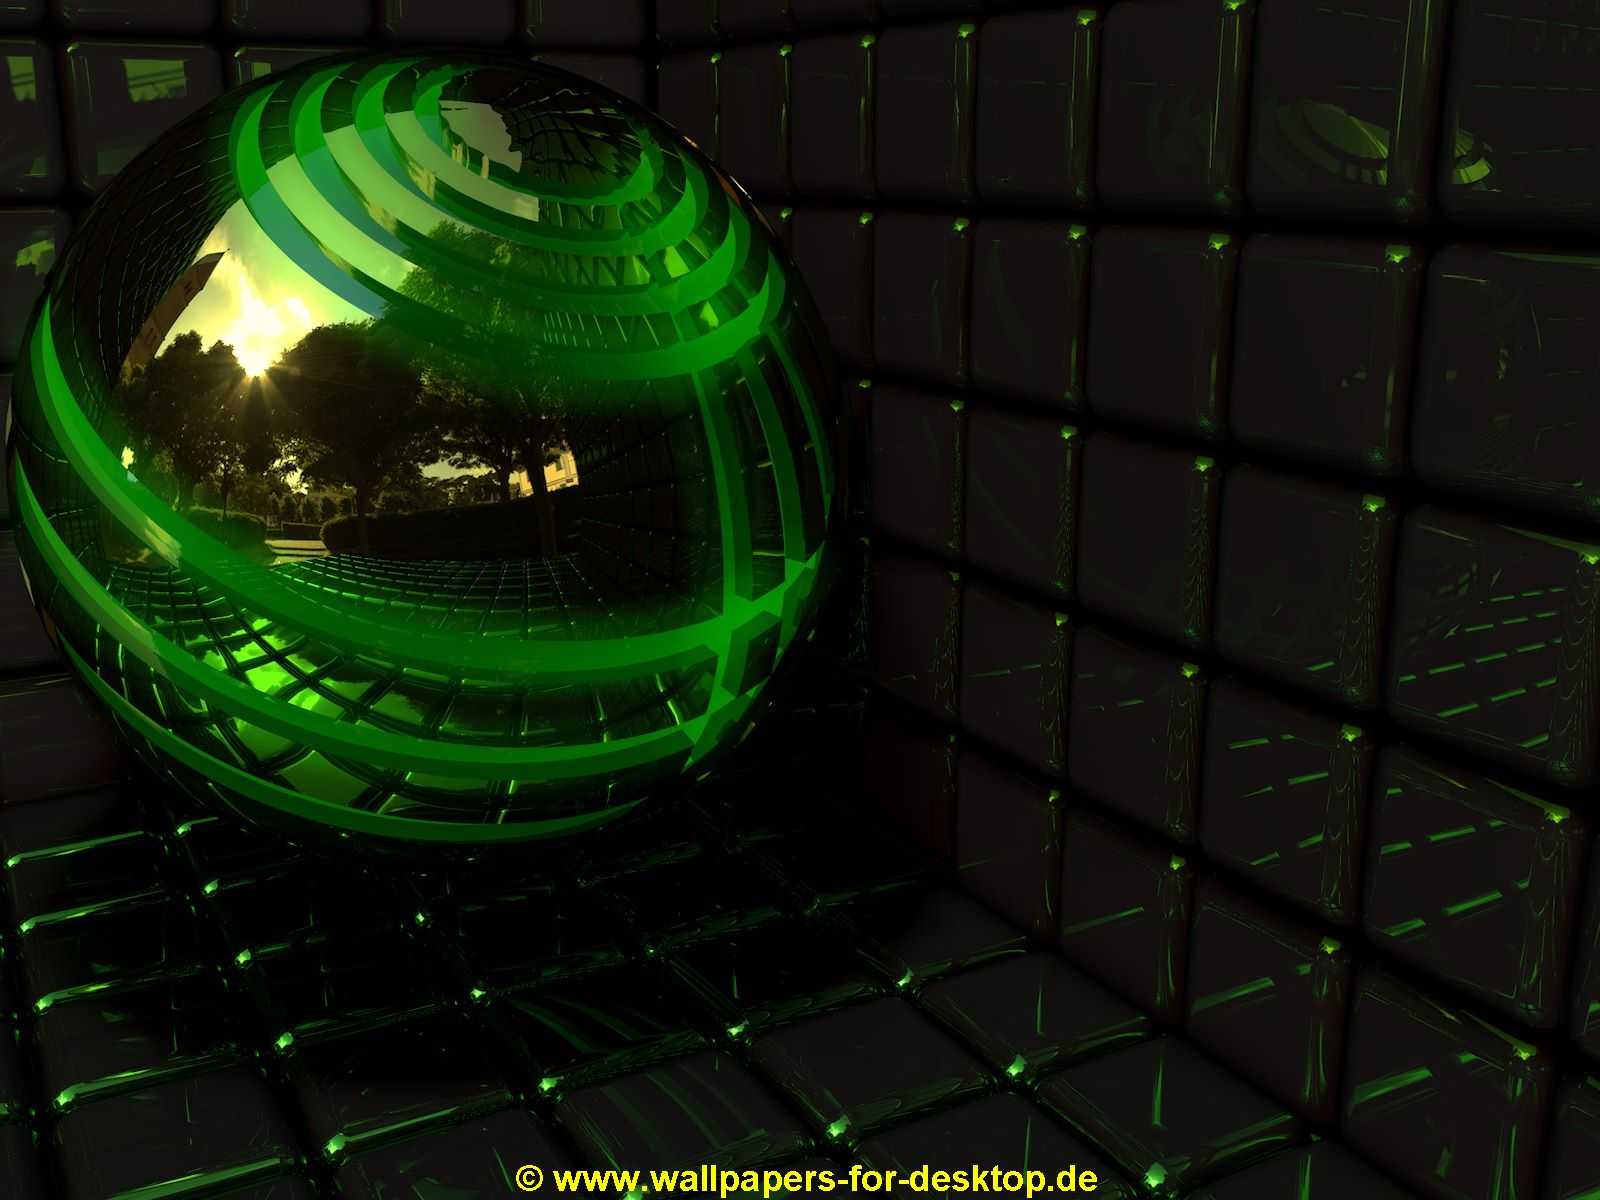 high definition wallpaper for desktop download high definition 1600x1200